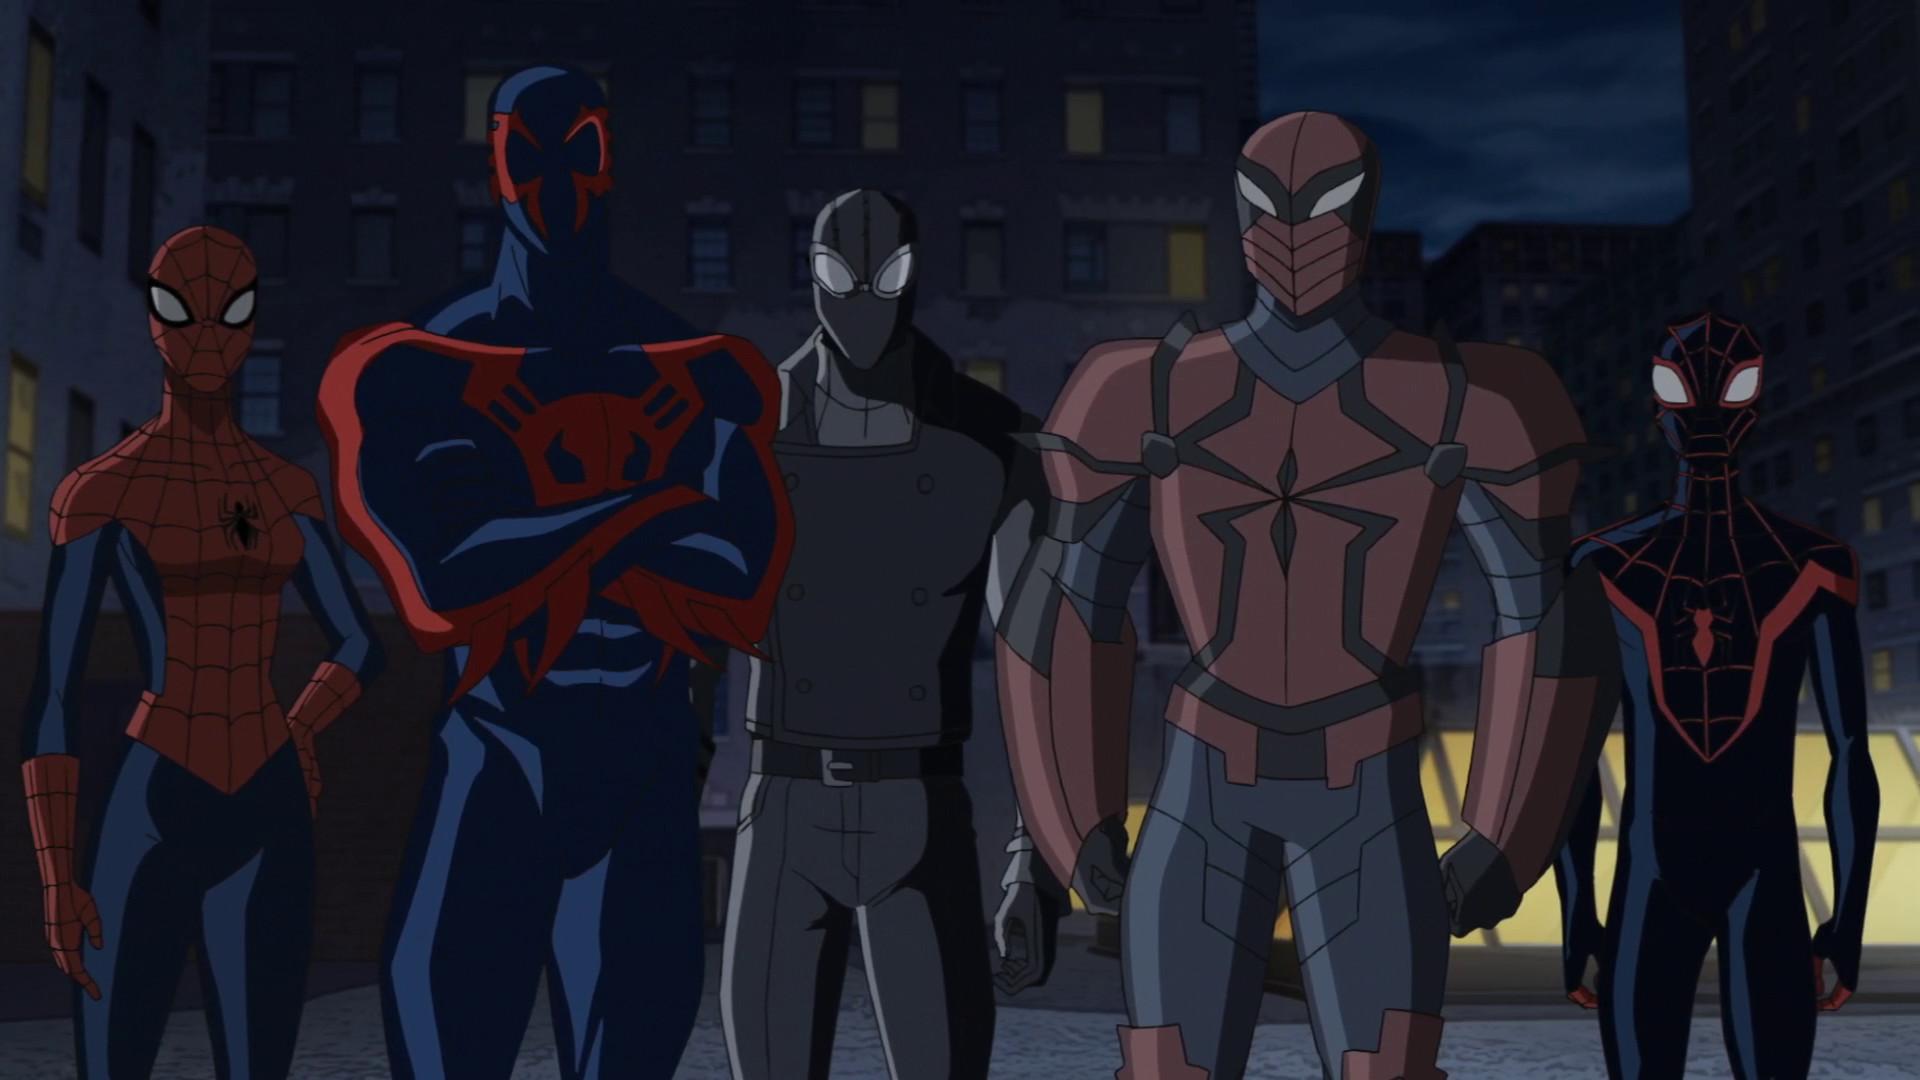 Image – Spider-Man 2099, Spider-Girl, Spider-Man Noir, Spyder-Knight, Miles  Morales USMWW.png | Disney Wiki | FANDOM powered by Wikia